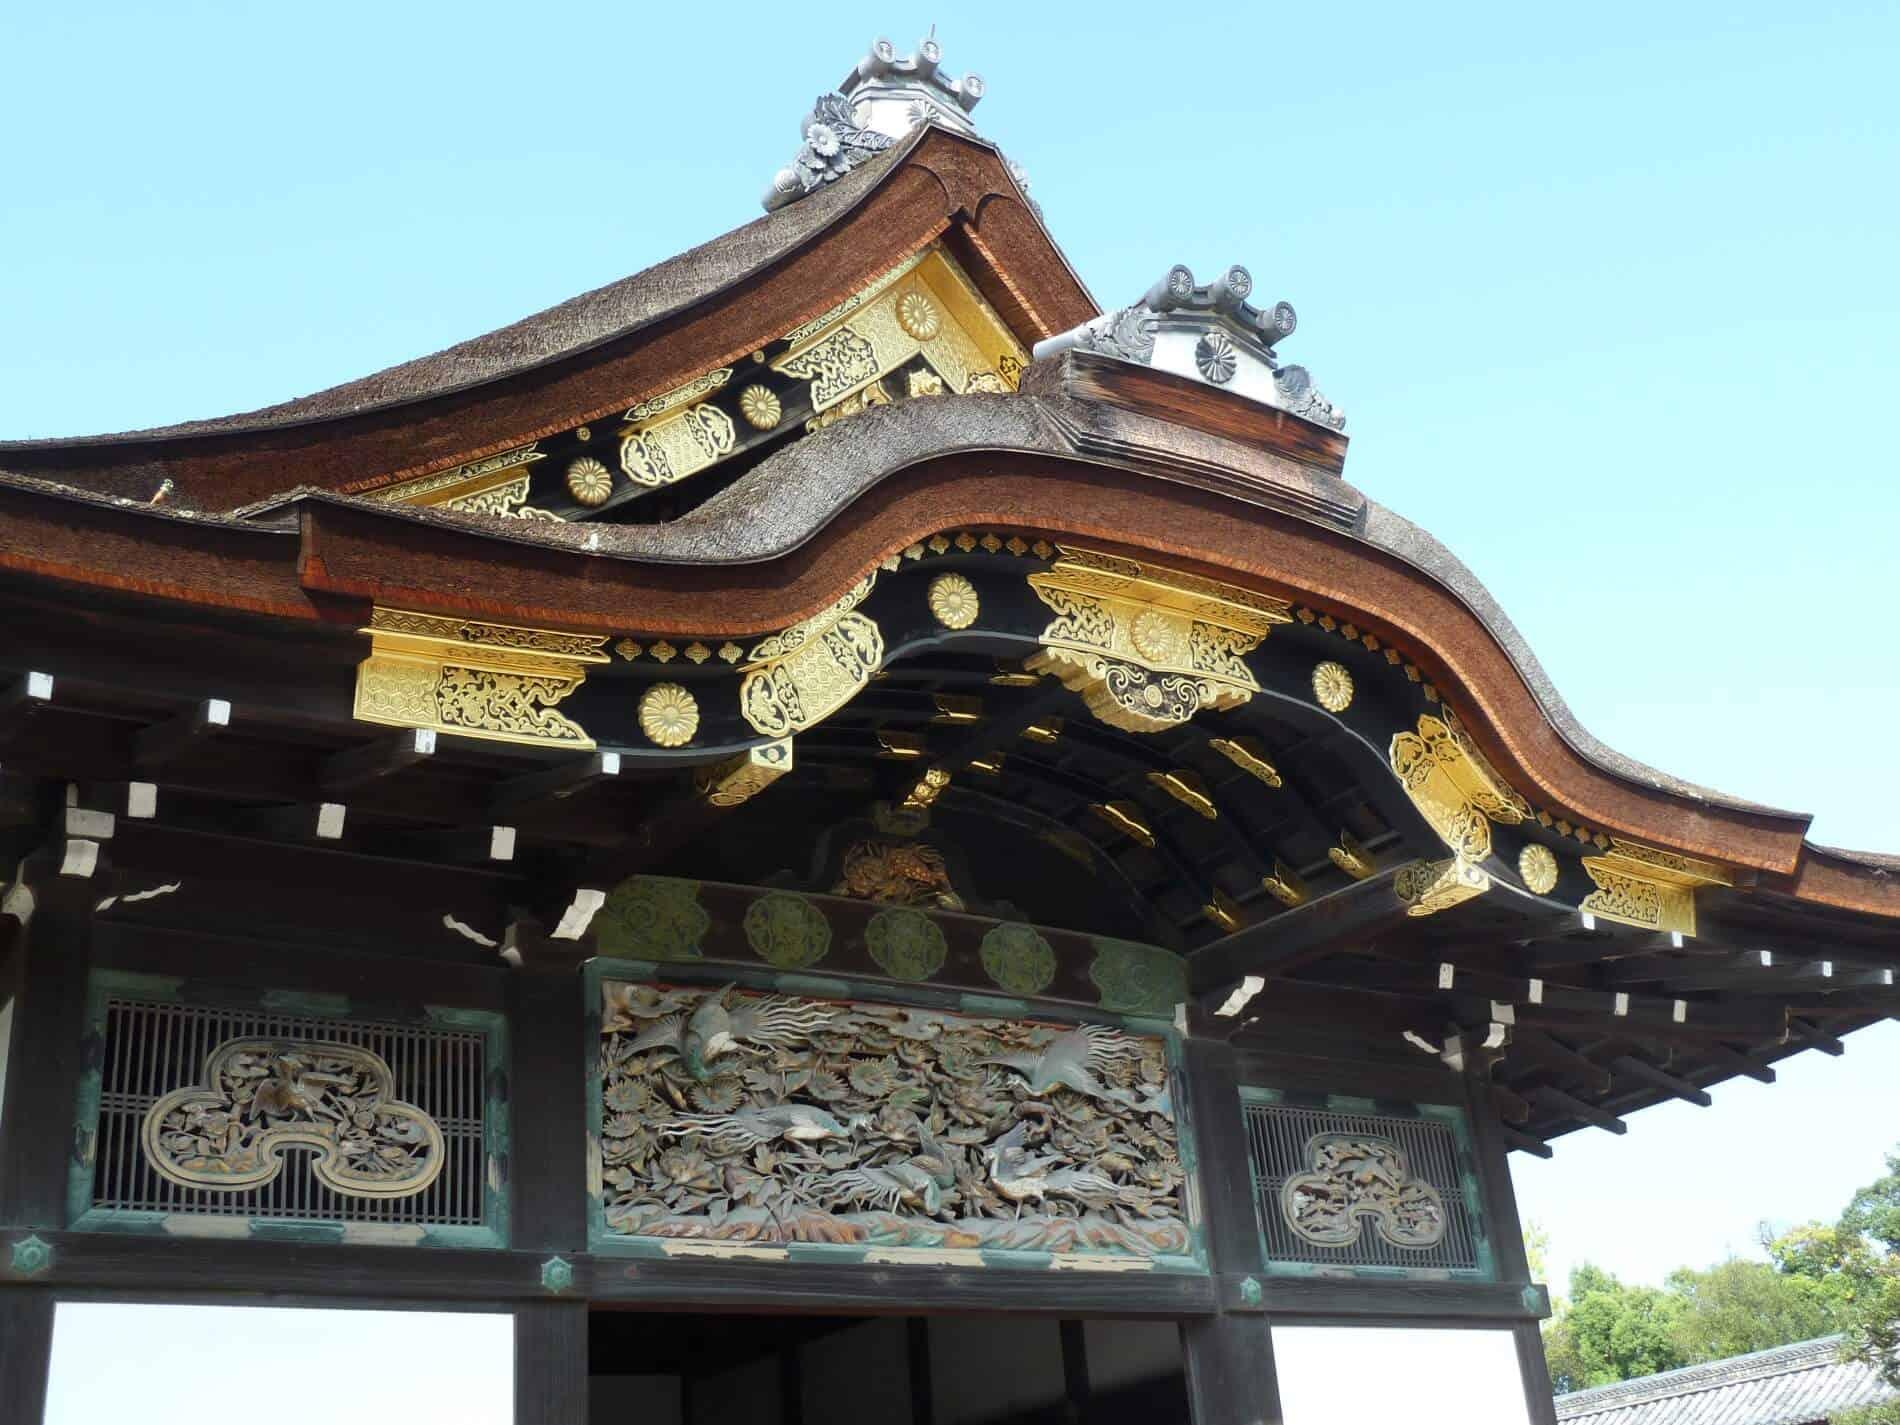 The magnificent gate of Nijo Castle in Kyoto